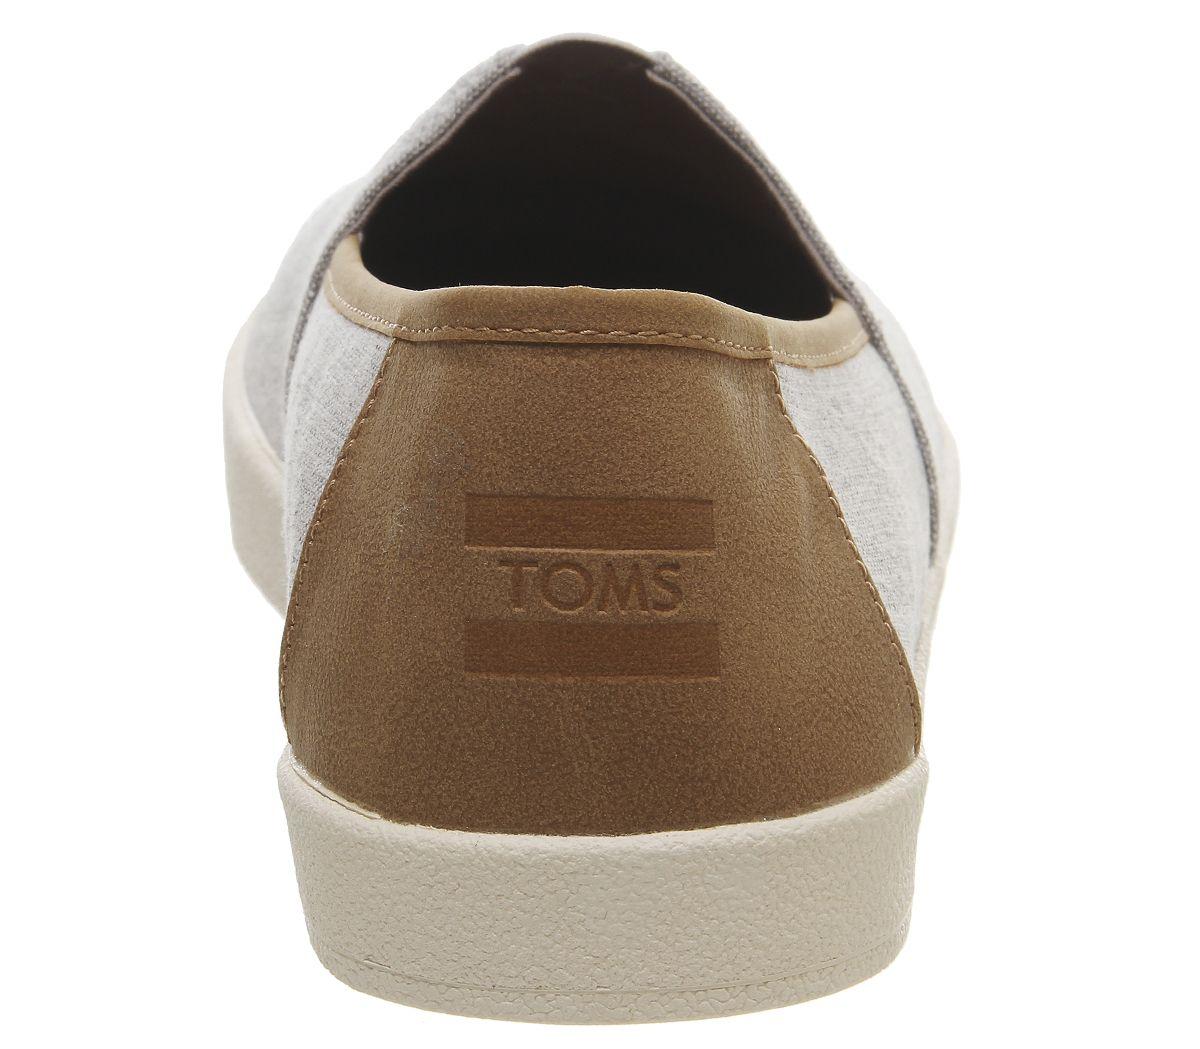 Para-Hombre-Toms-Avalon-Cupsole-Slip-Ons-llovizna-Gris-Chambray-Informal-Zapatos miniatura 4